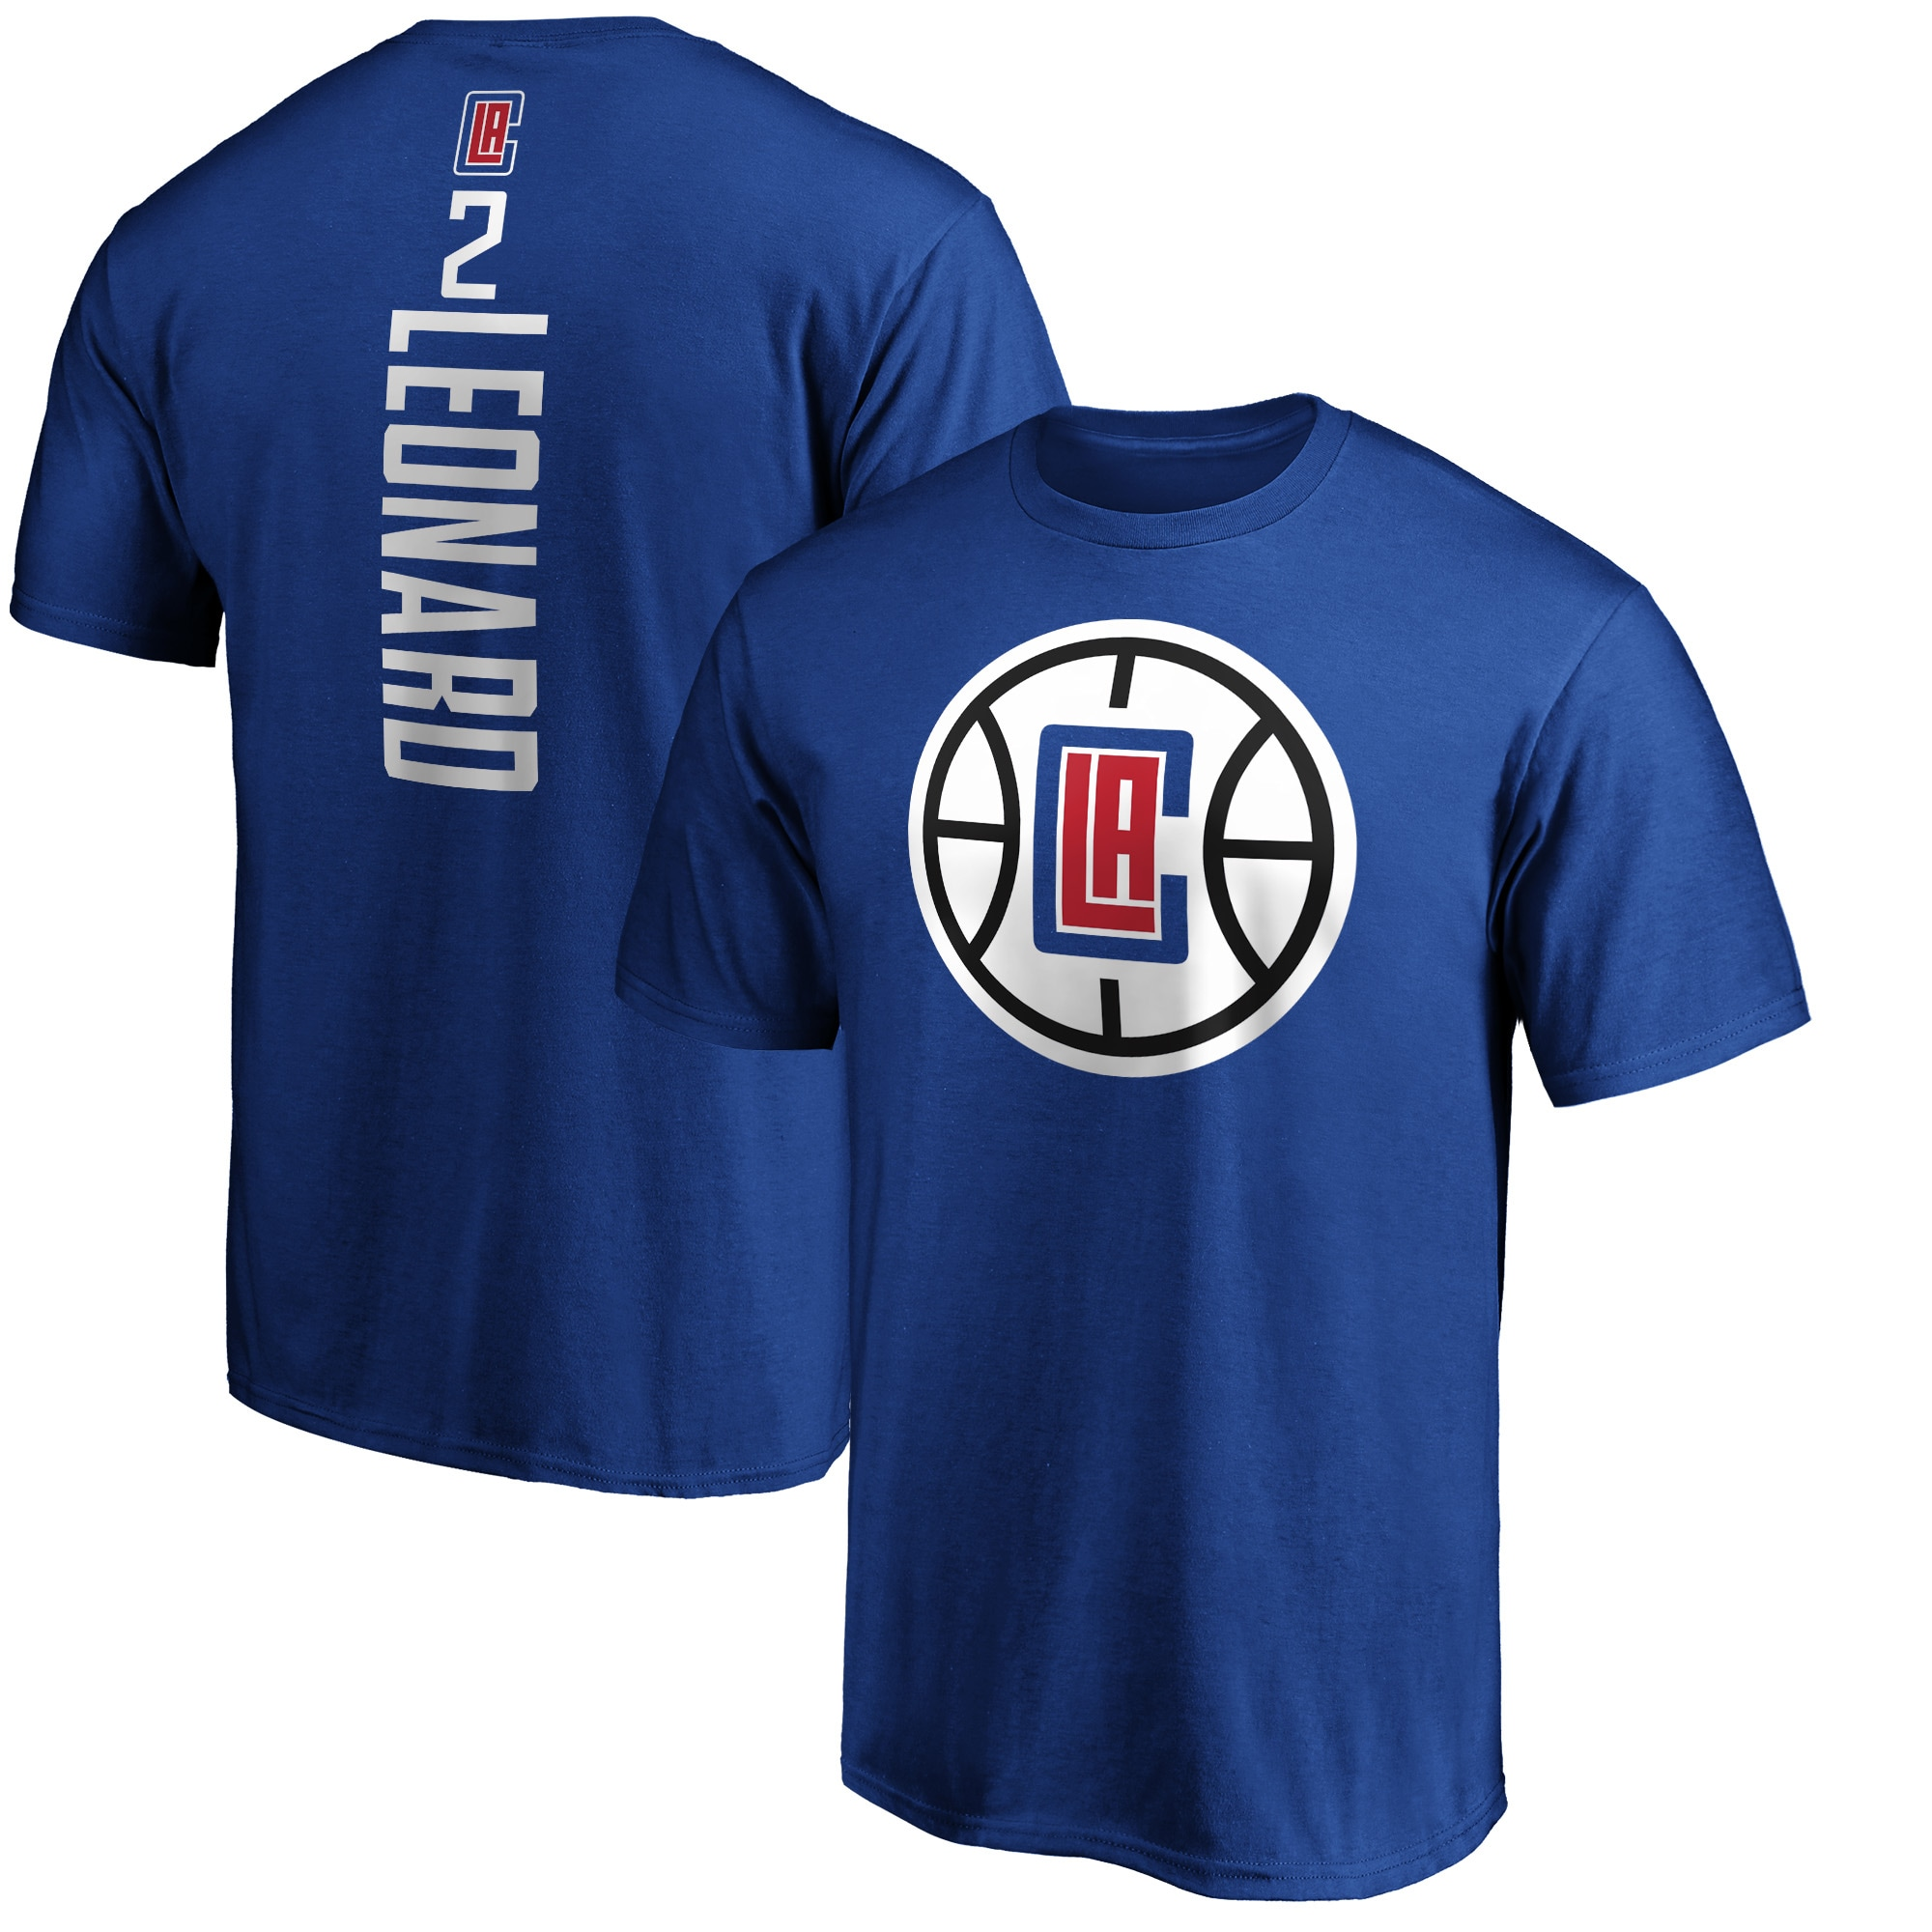 Kawhi Leonard LA Clippers Fanatics Branded Big & Tall Playmaker Name & Number Team T-Shirt - Royal